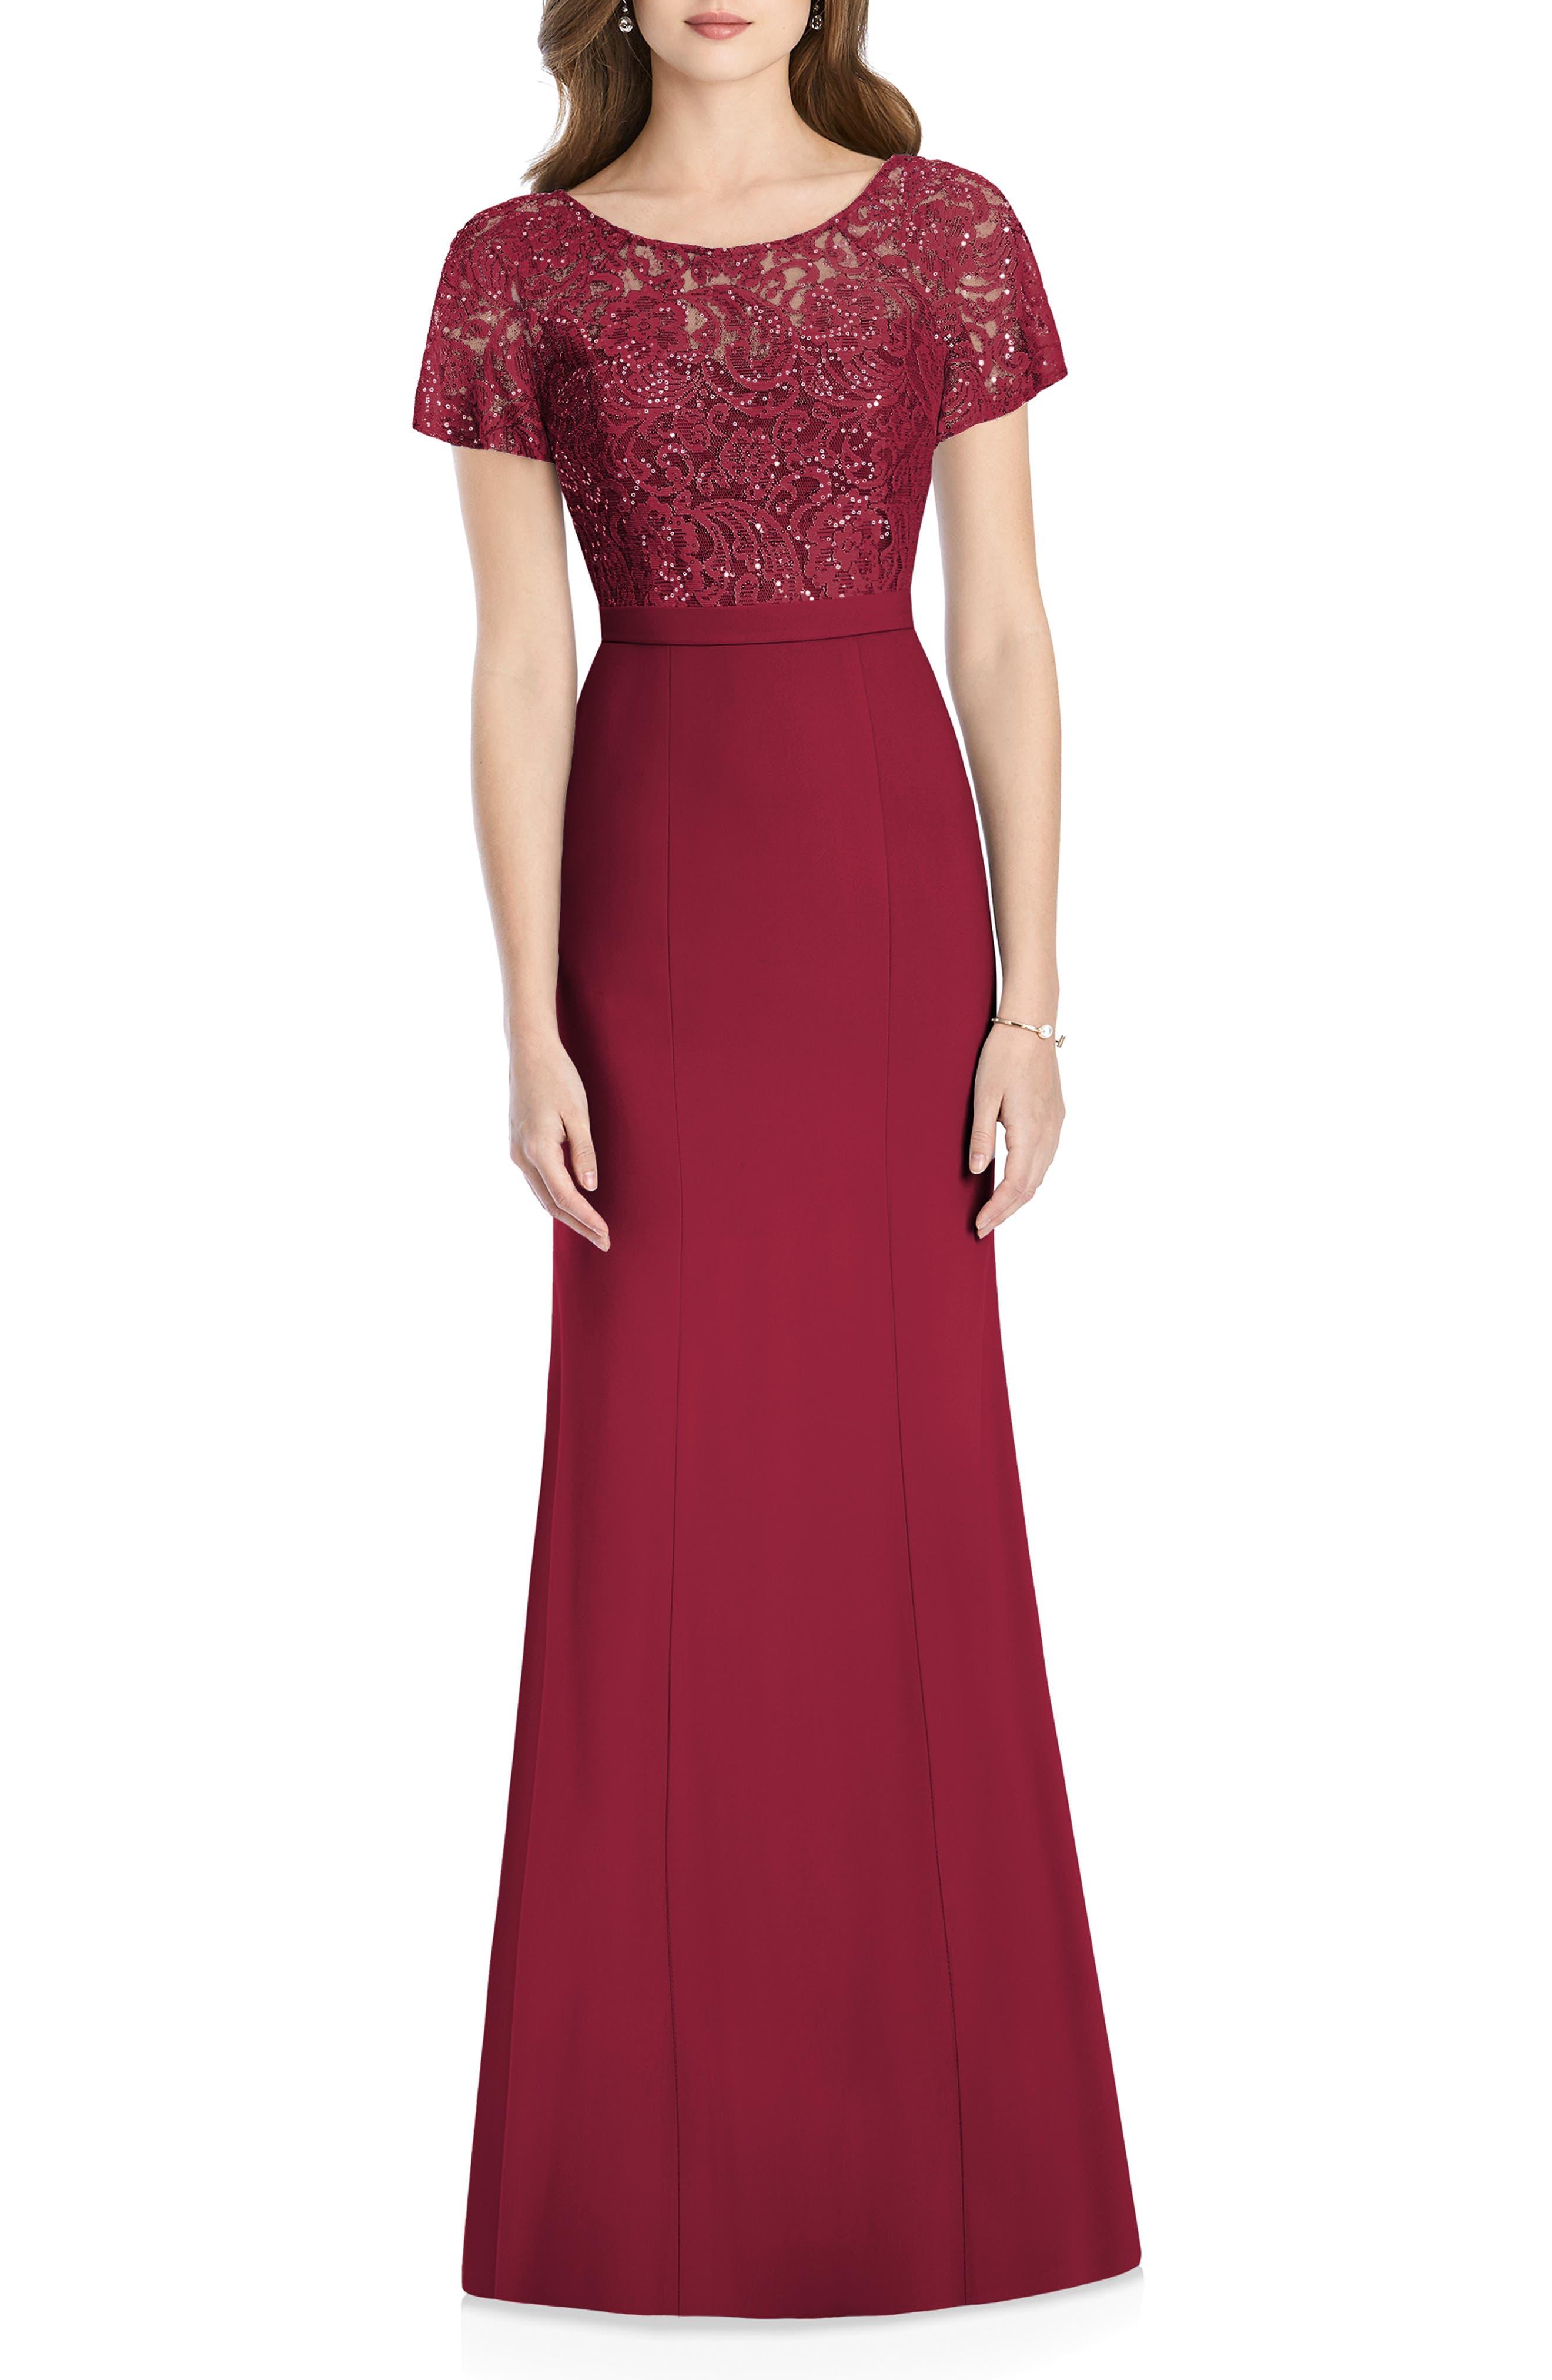 JENNY PACKHAM Embellished Lace Gown, Main, color, BURGUNDY